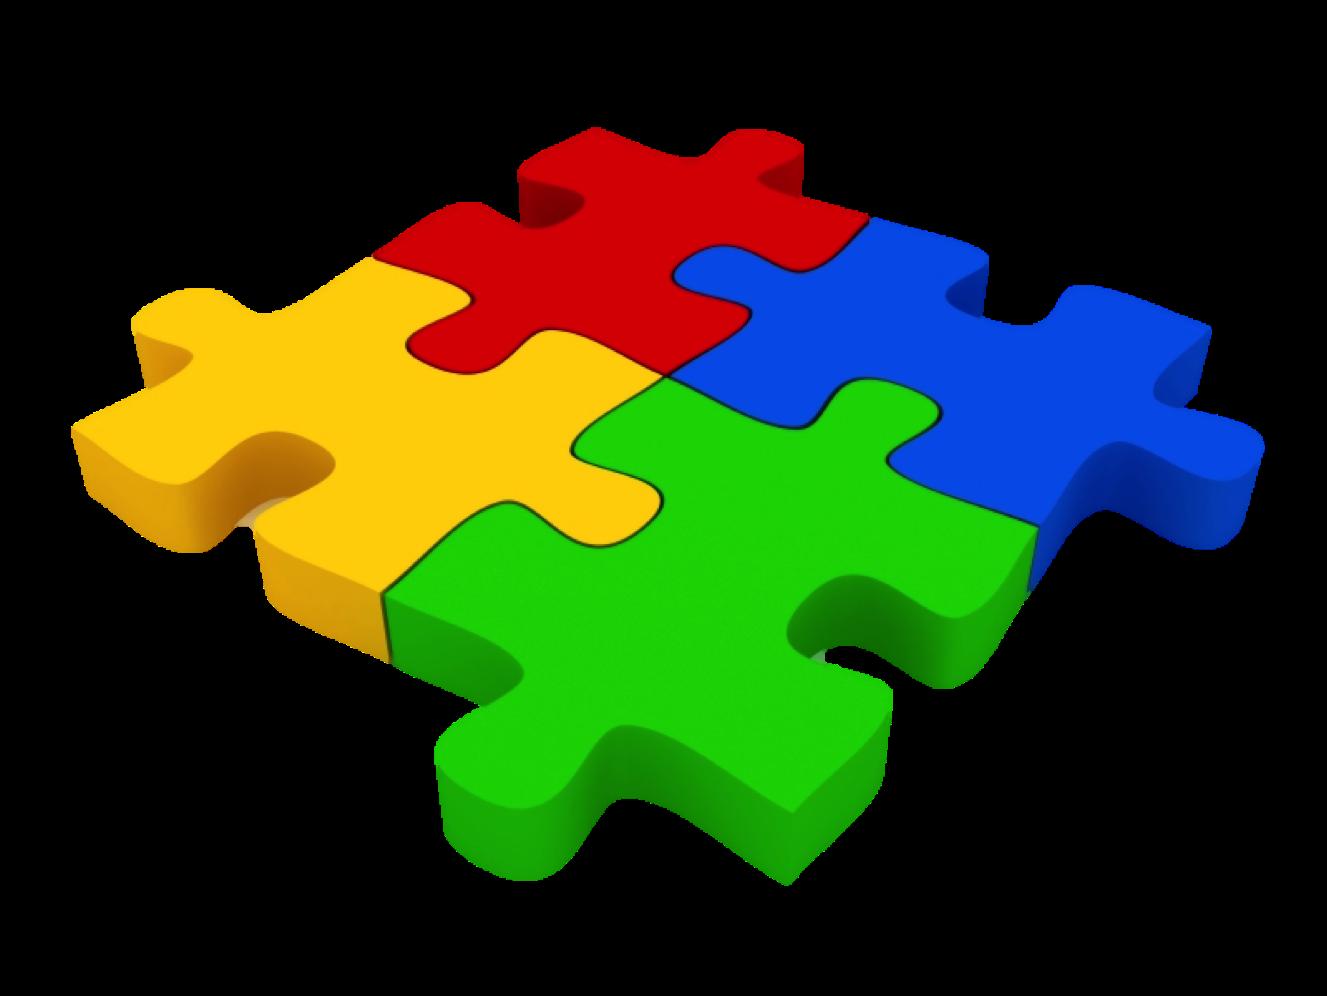 Puzzle clipart scenario. Improve organizational productivity by